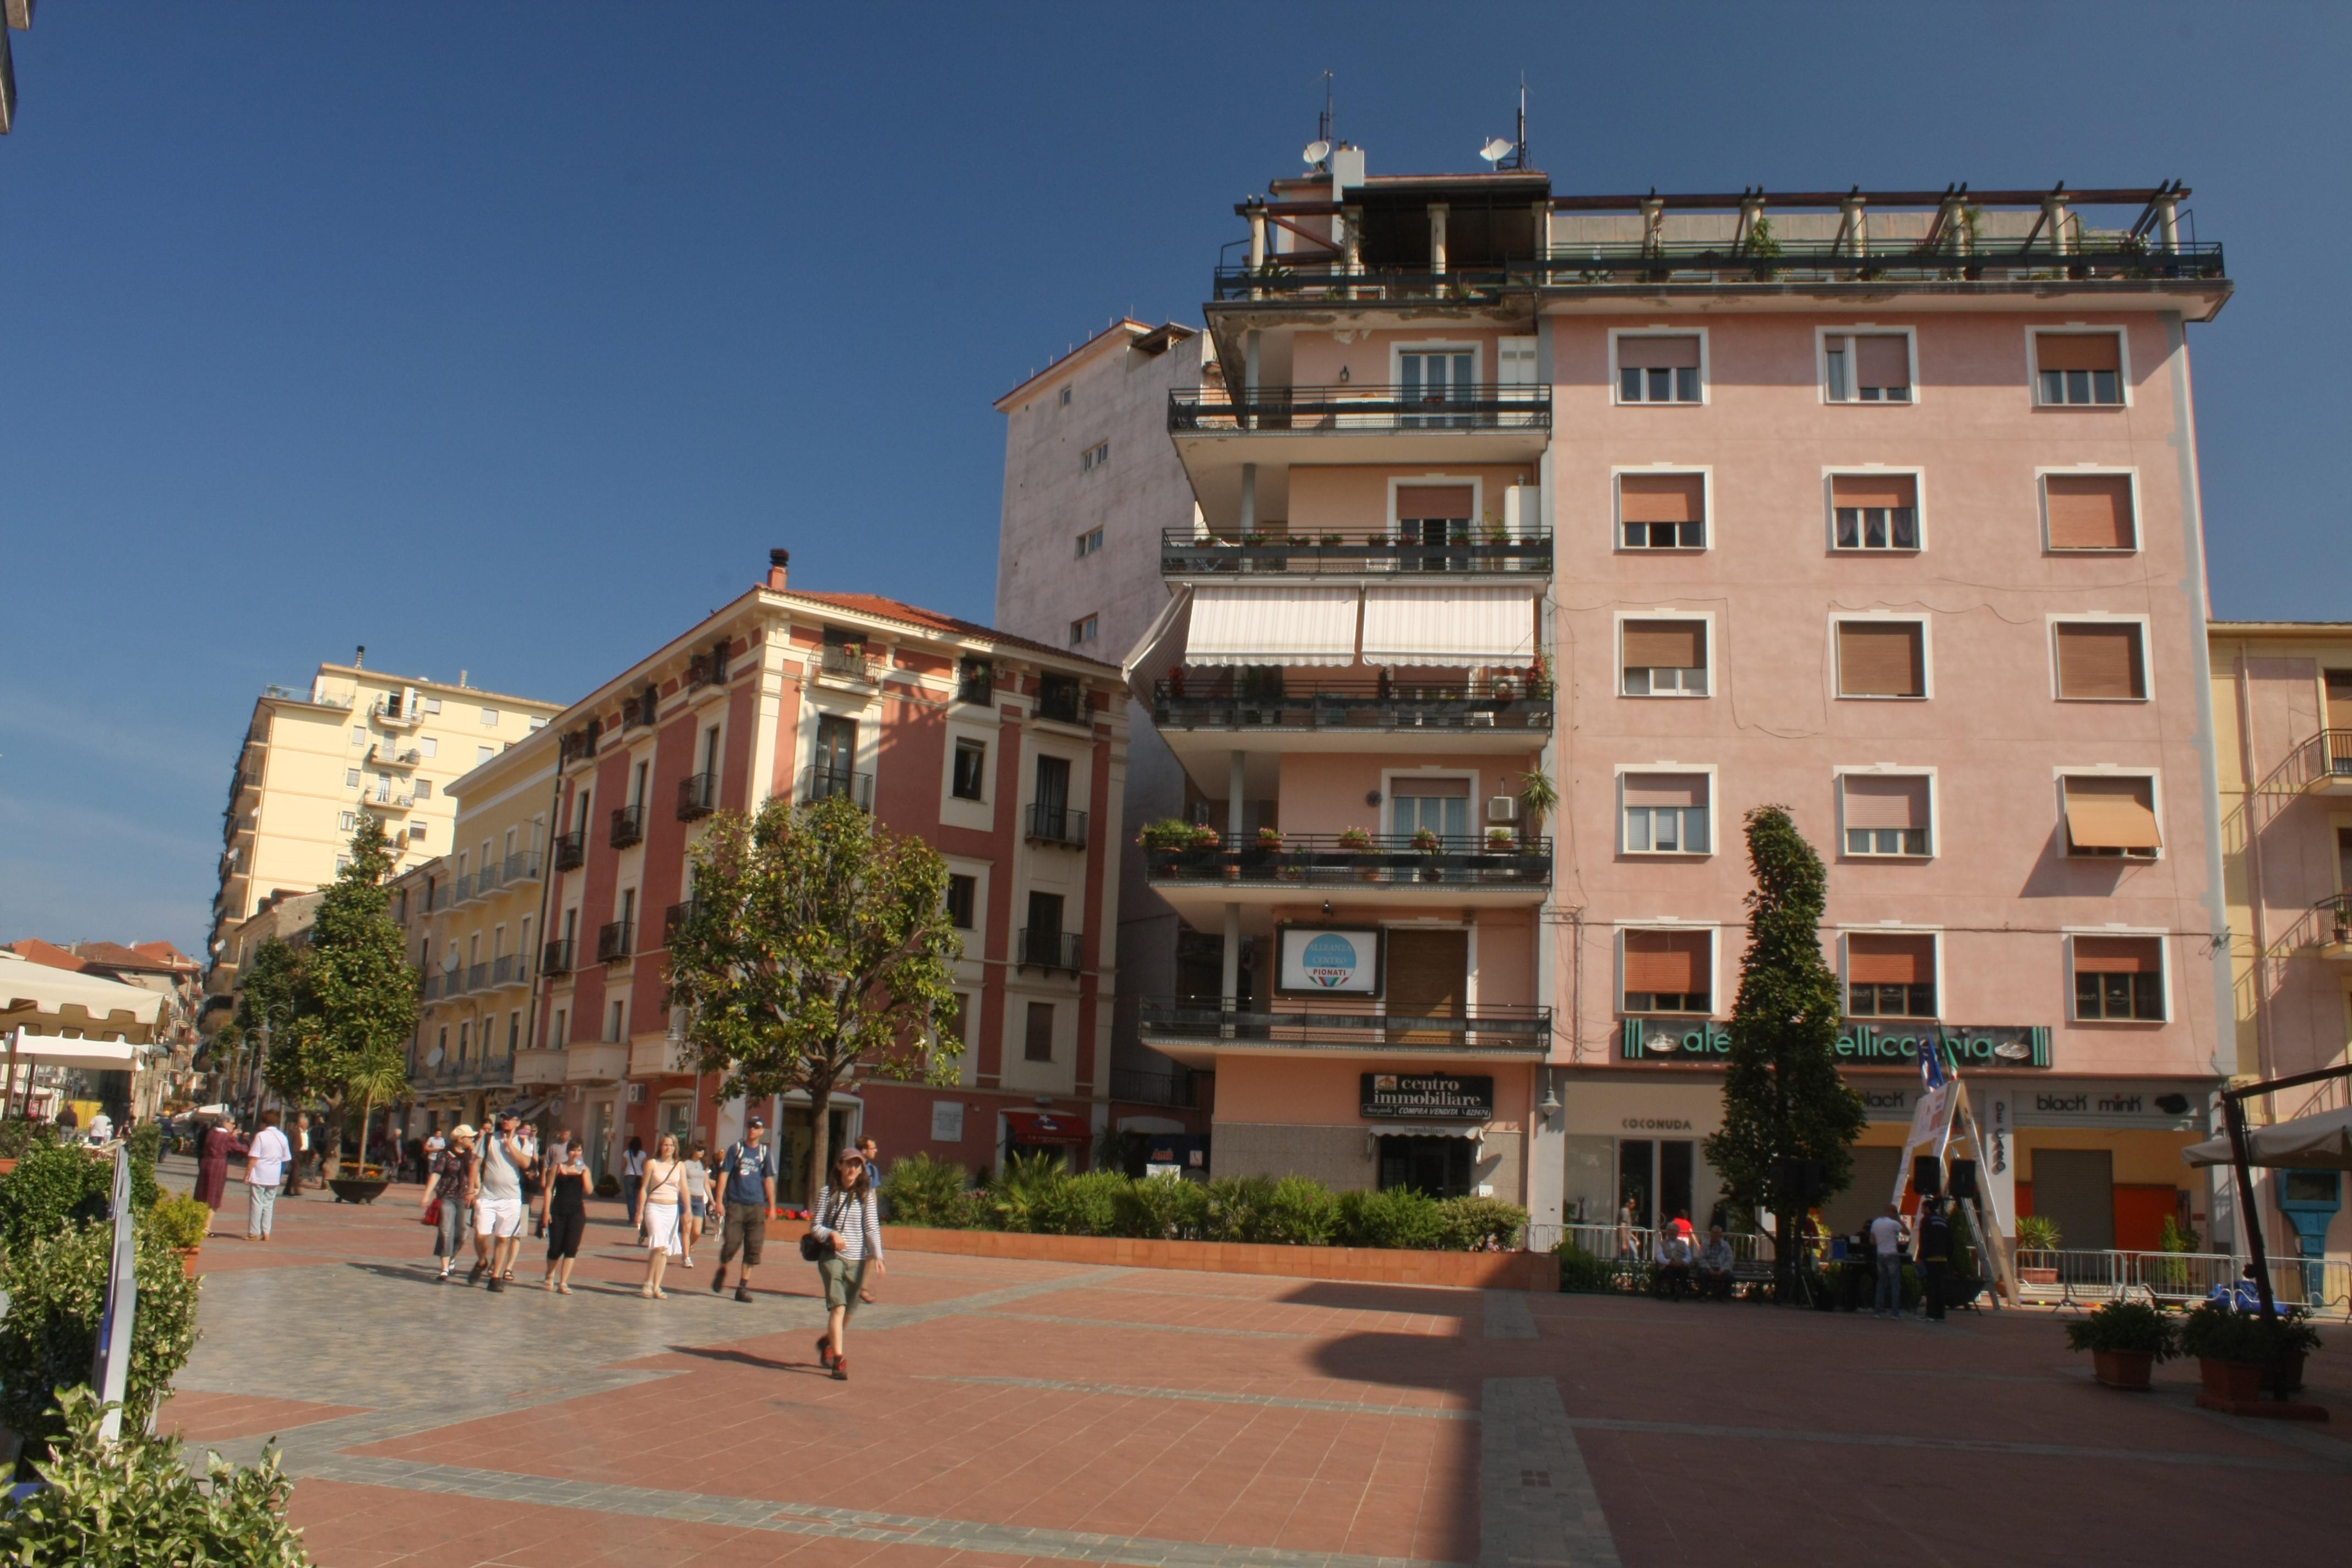 File:Agropoli, Italy - May 2010 (27).jpg - Wikimedia Commons: commons.wikimedia.org/wiki/file:agropoli,_italy_-_may_2010_(27).jpg